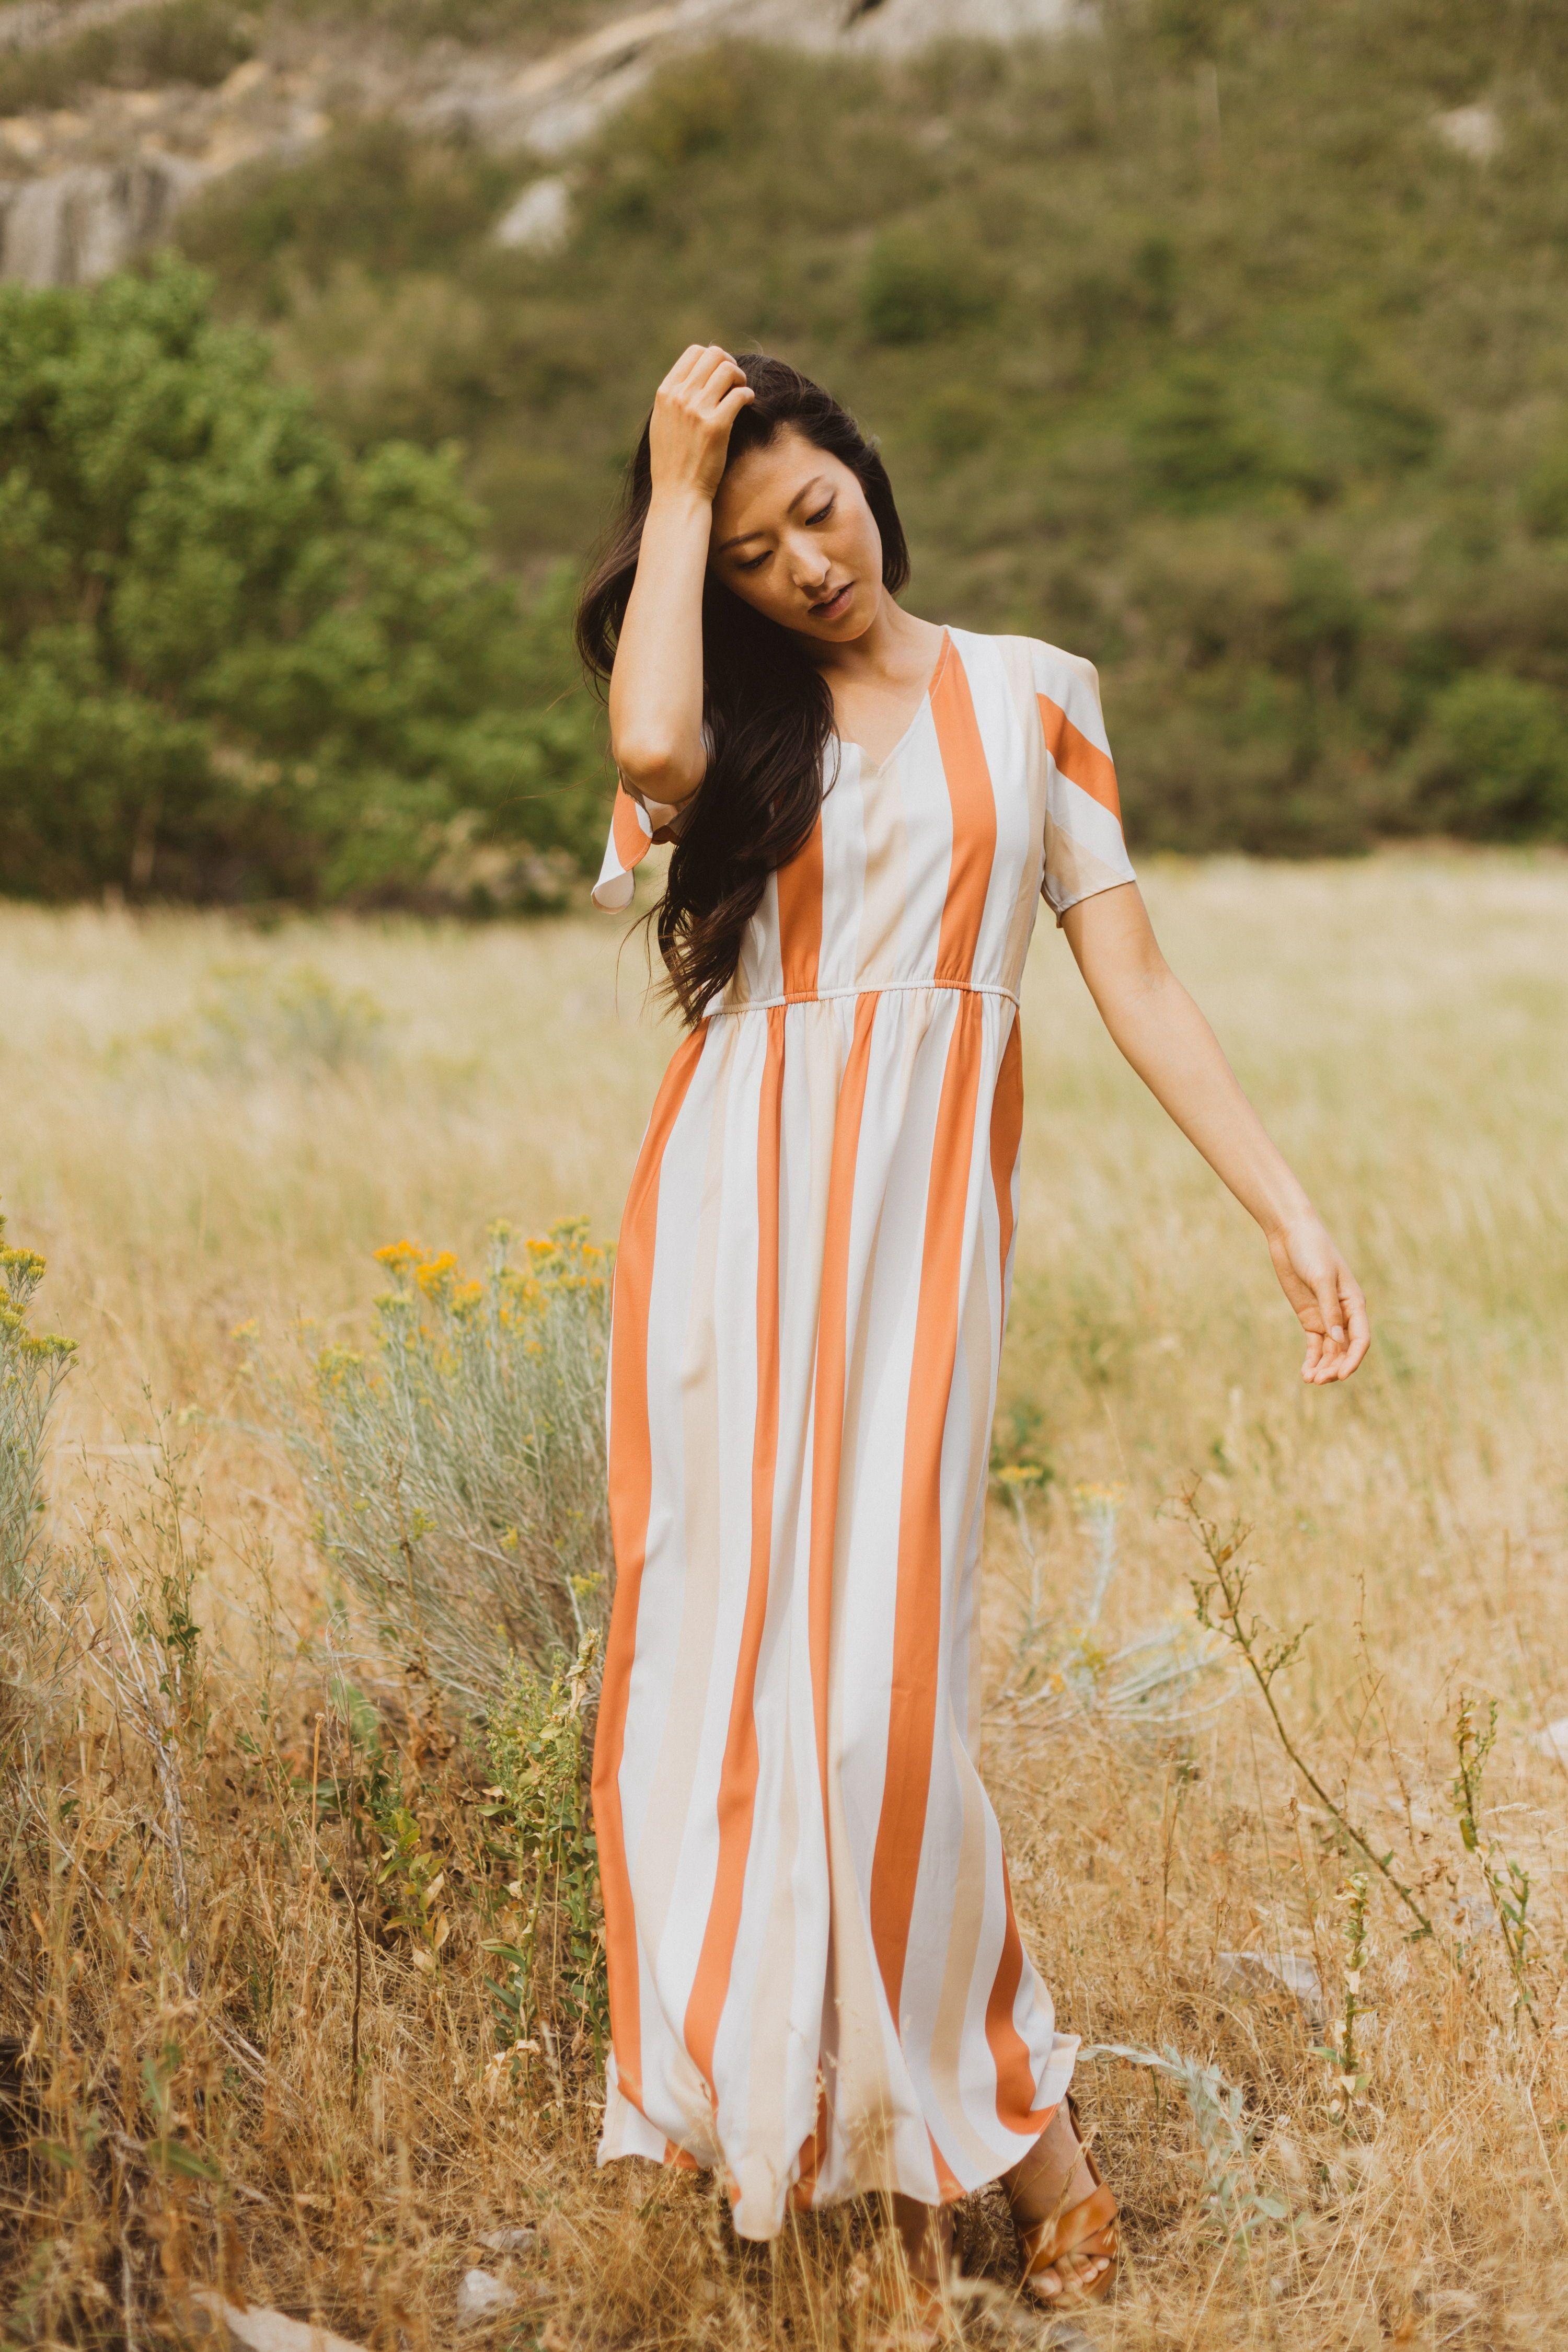 The Butler Striped Maxi Dress Features A Soft V Neckline With Vertical Stripes Down In Pumpkin Pale Peach Against A Neutral C Striped Maxi Fashion Maxi Dress [ 4500 x 3000 Pixel ]